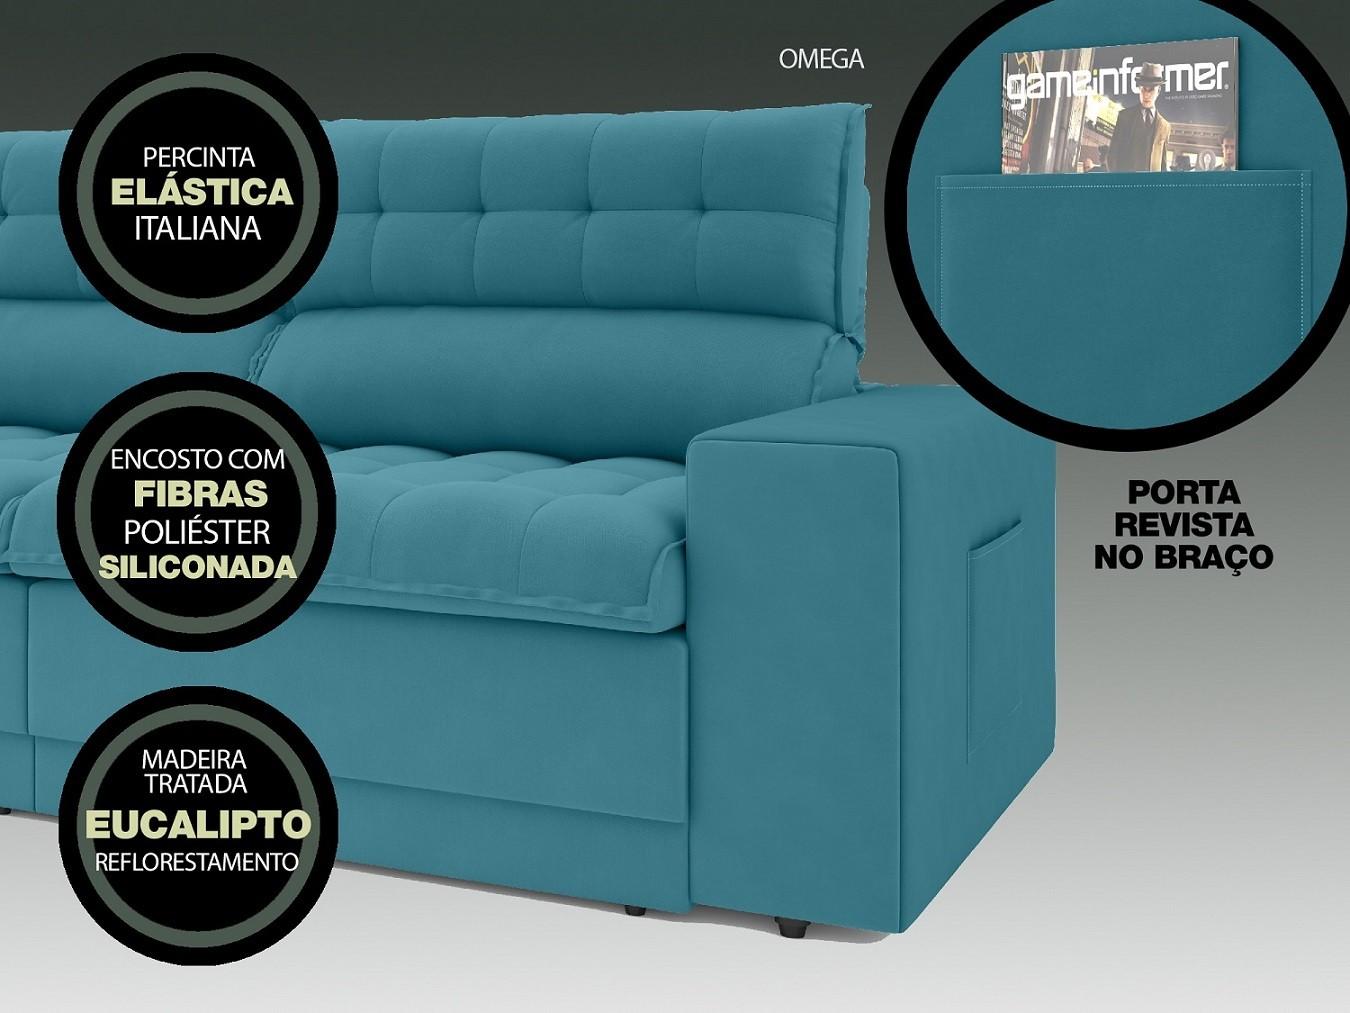 Sofá Omega 2,00m Assento Retrátil e Reclinável Velosuede Turquesa - NETSOFAS  - NETSOFÁS